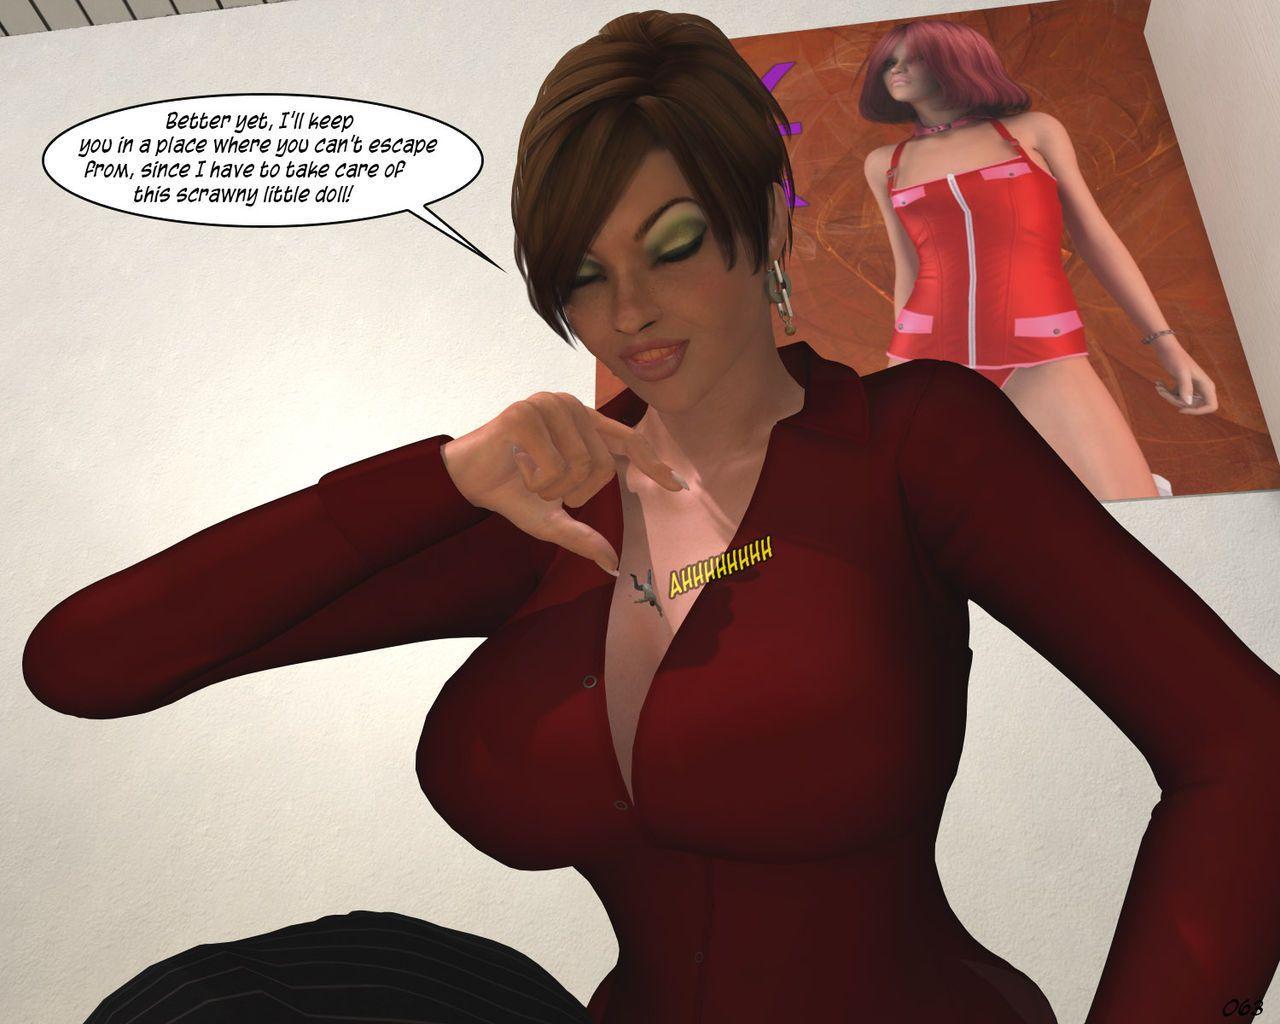 Wonder Woman Adventure - PhotoShrink! - part 4